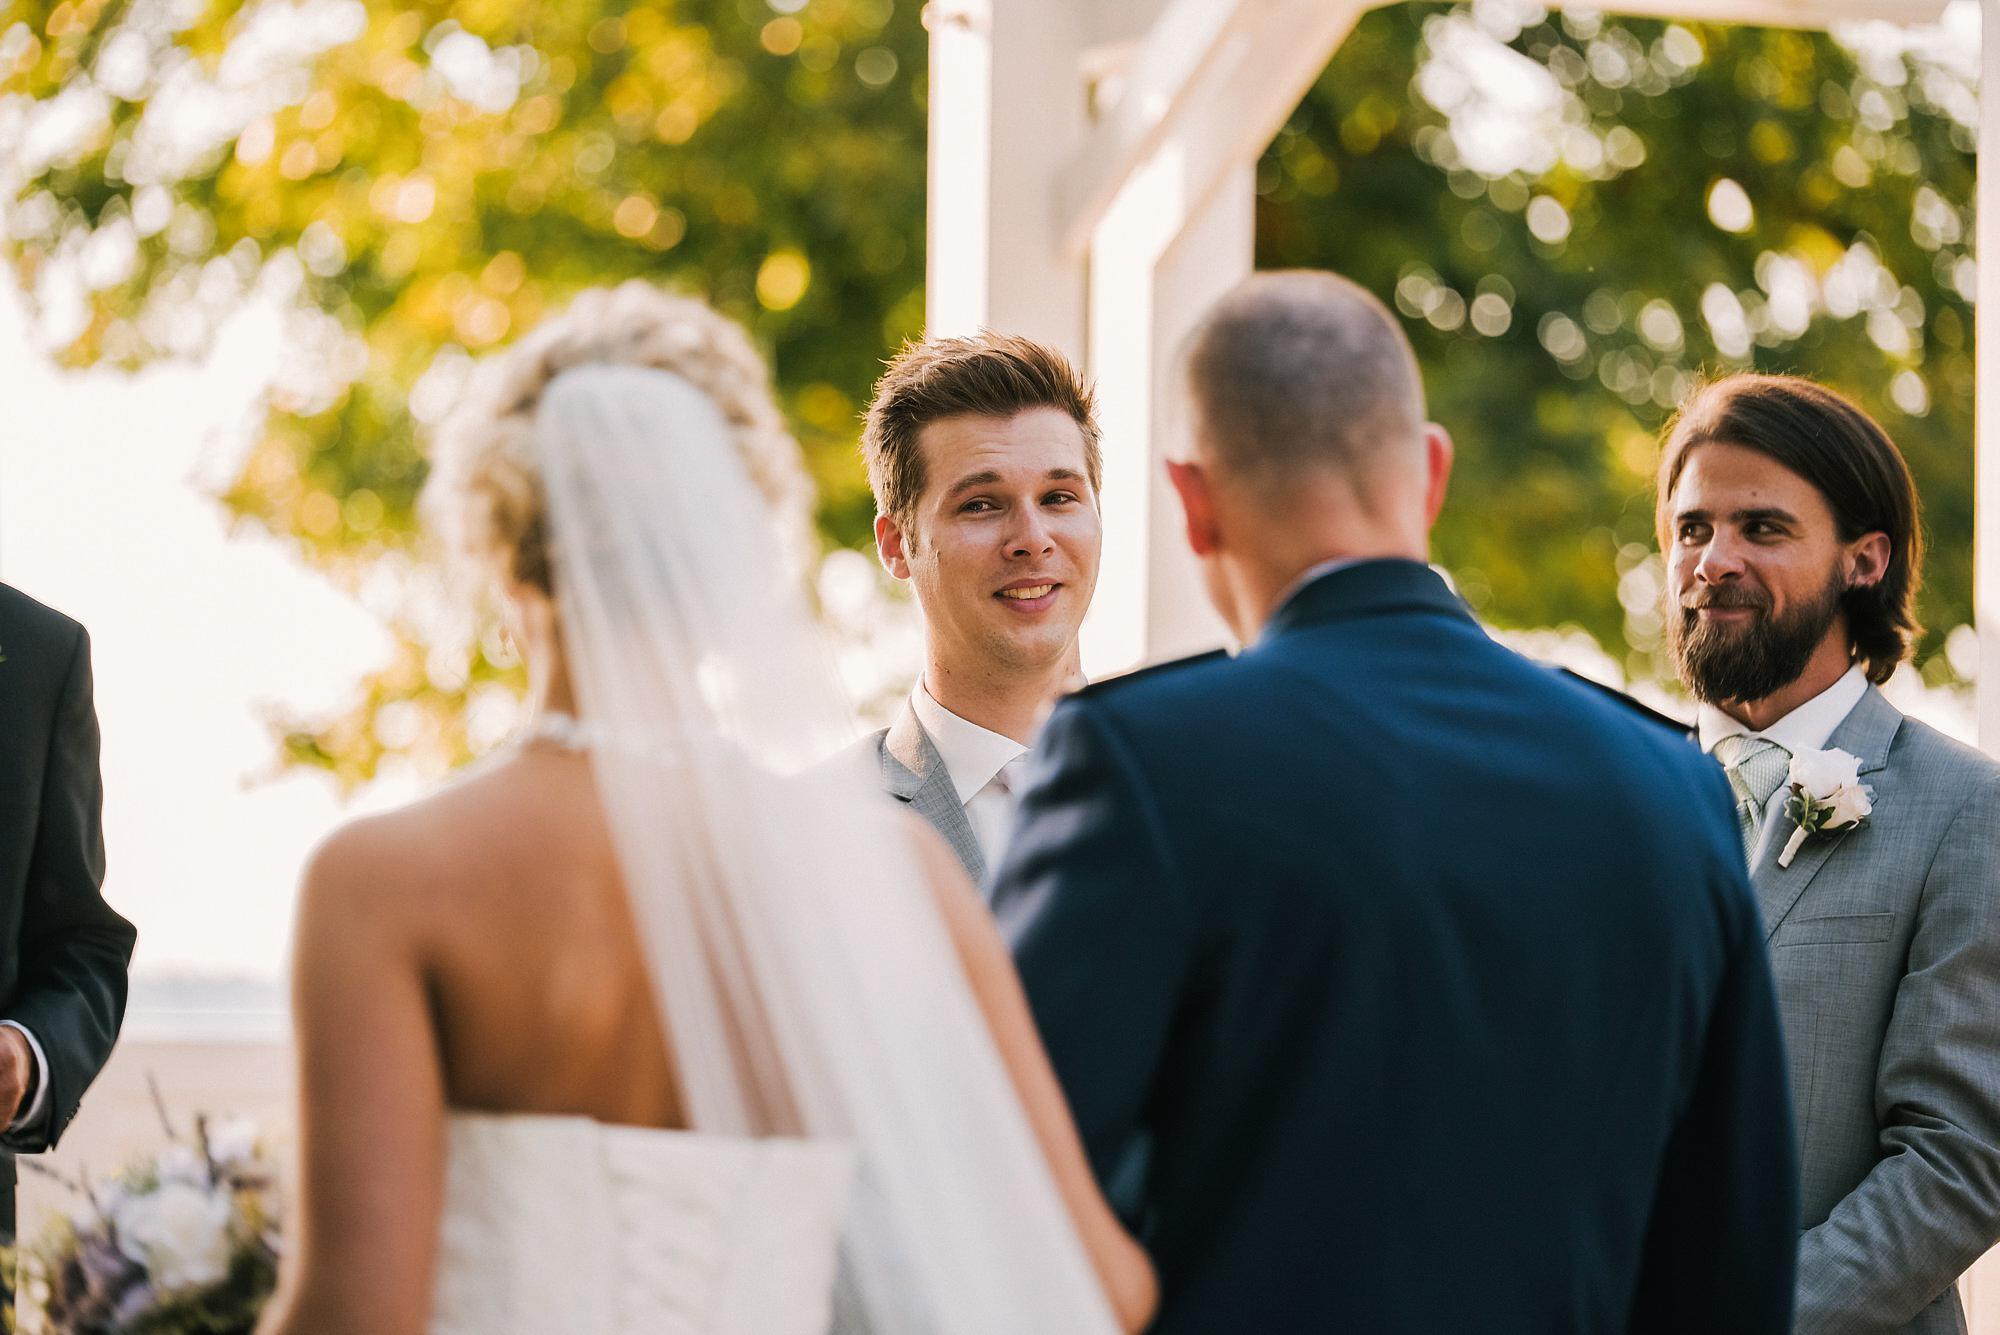 wedding-photography-virginia_0021.jpg